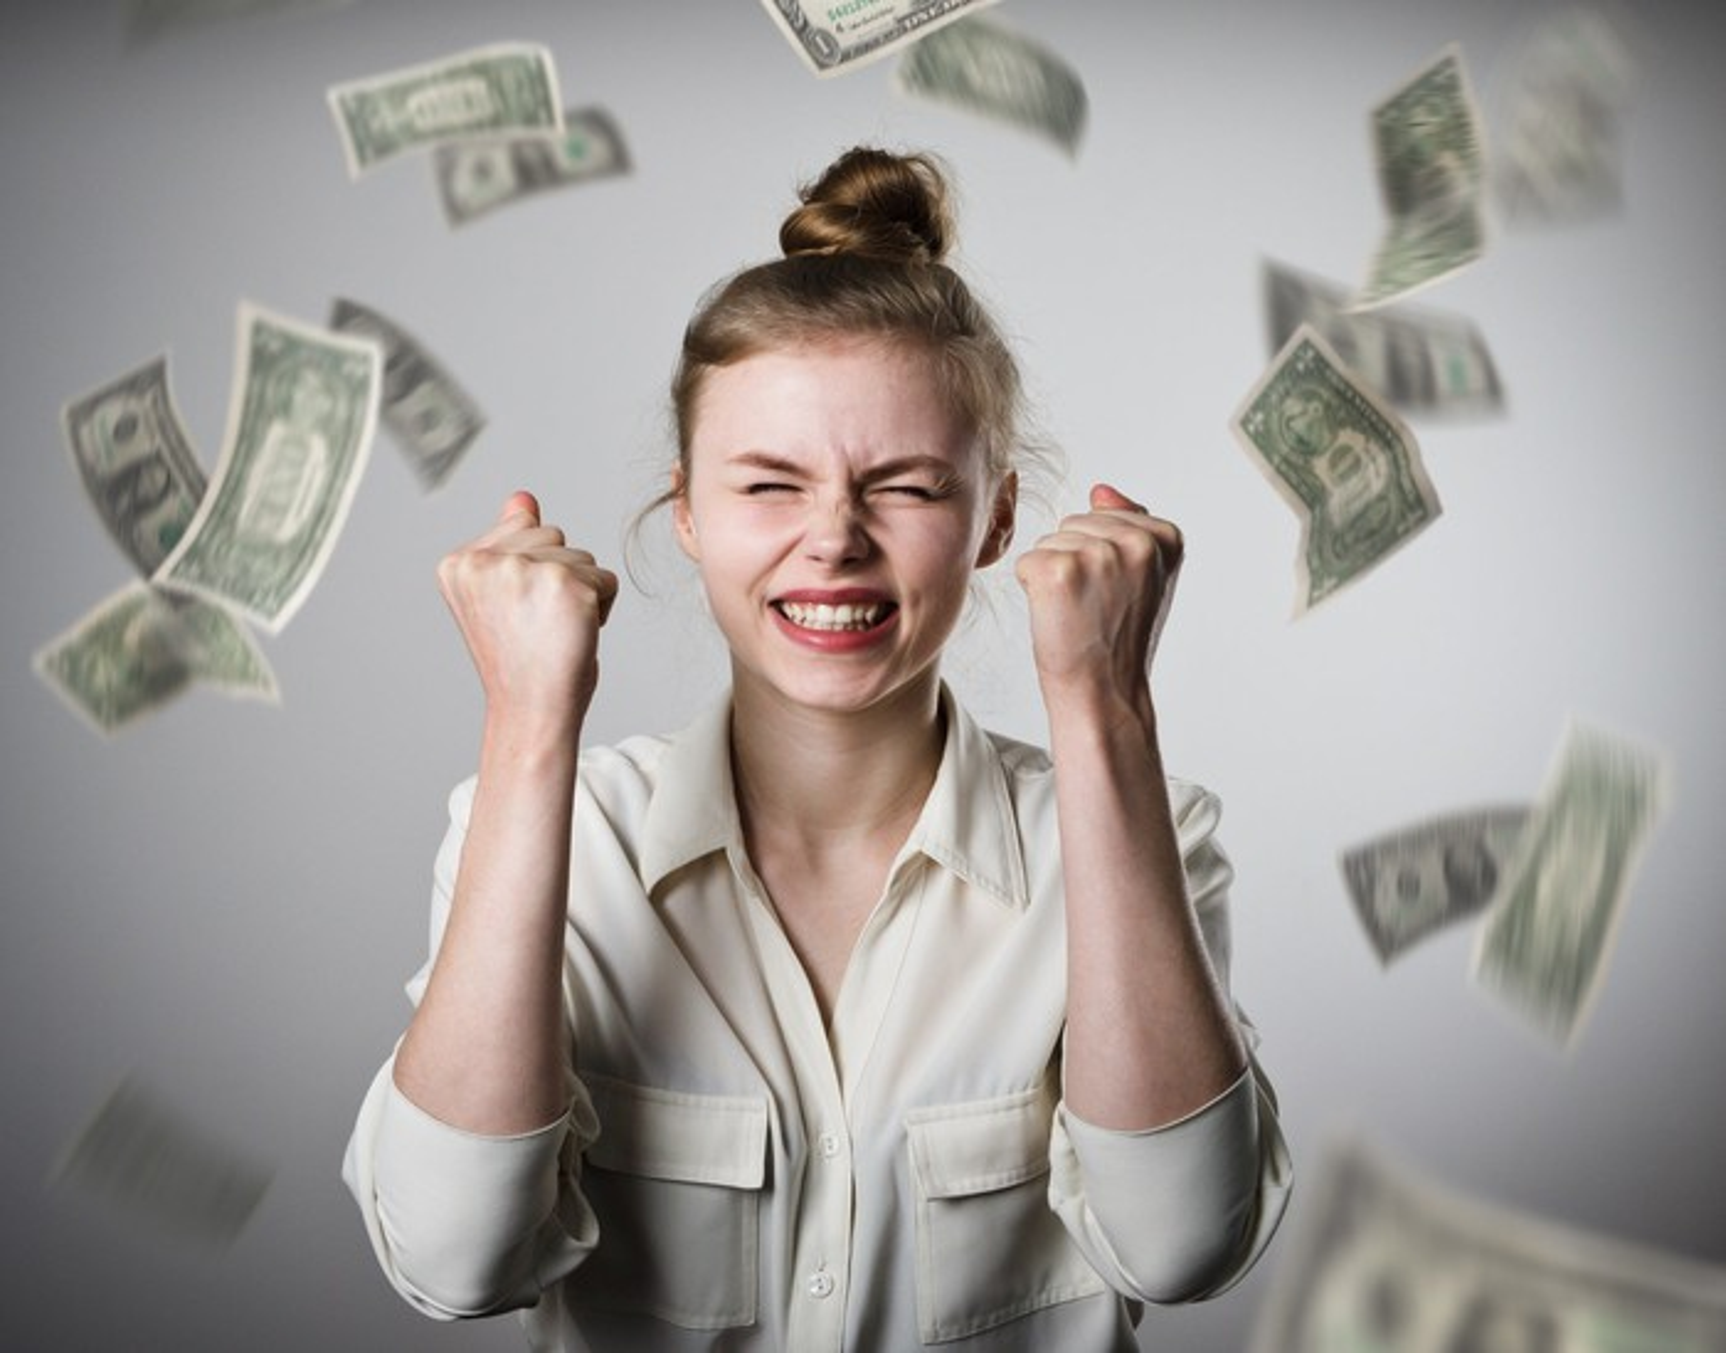 Money raining down on woman